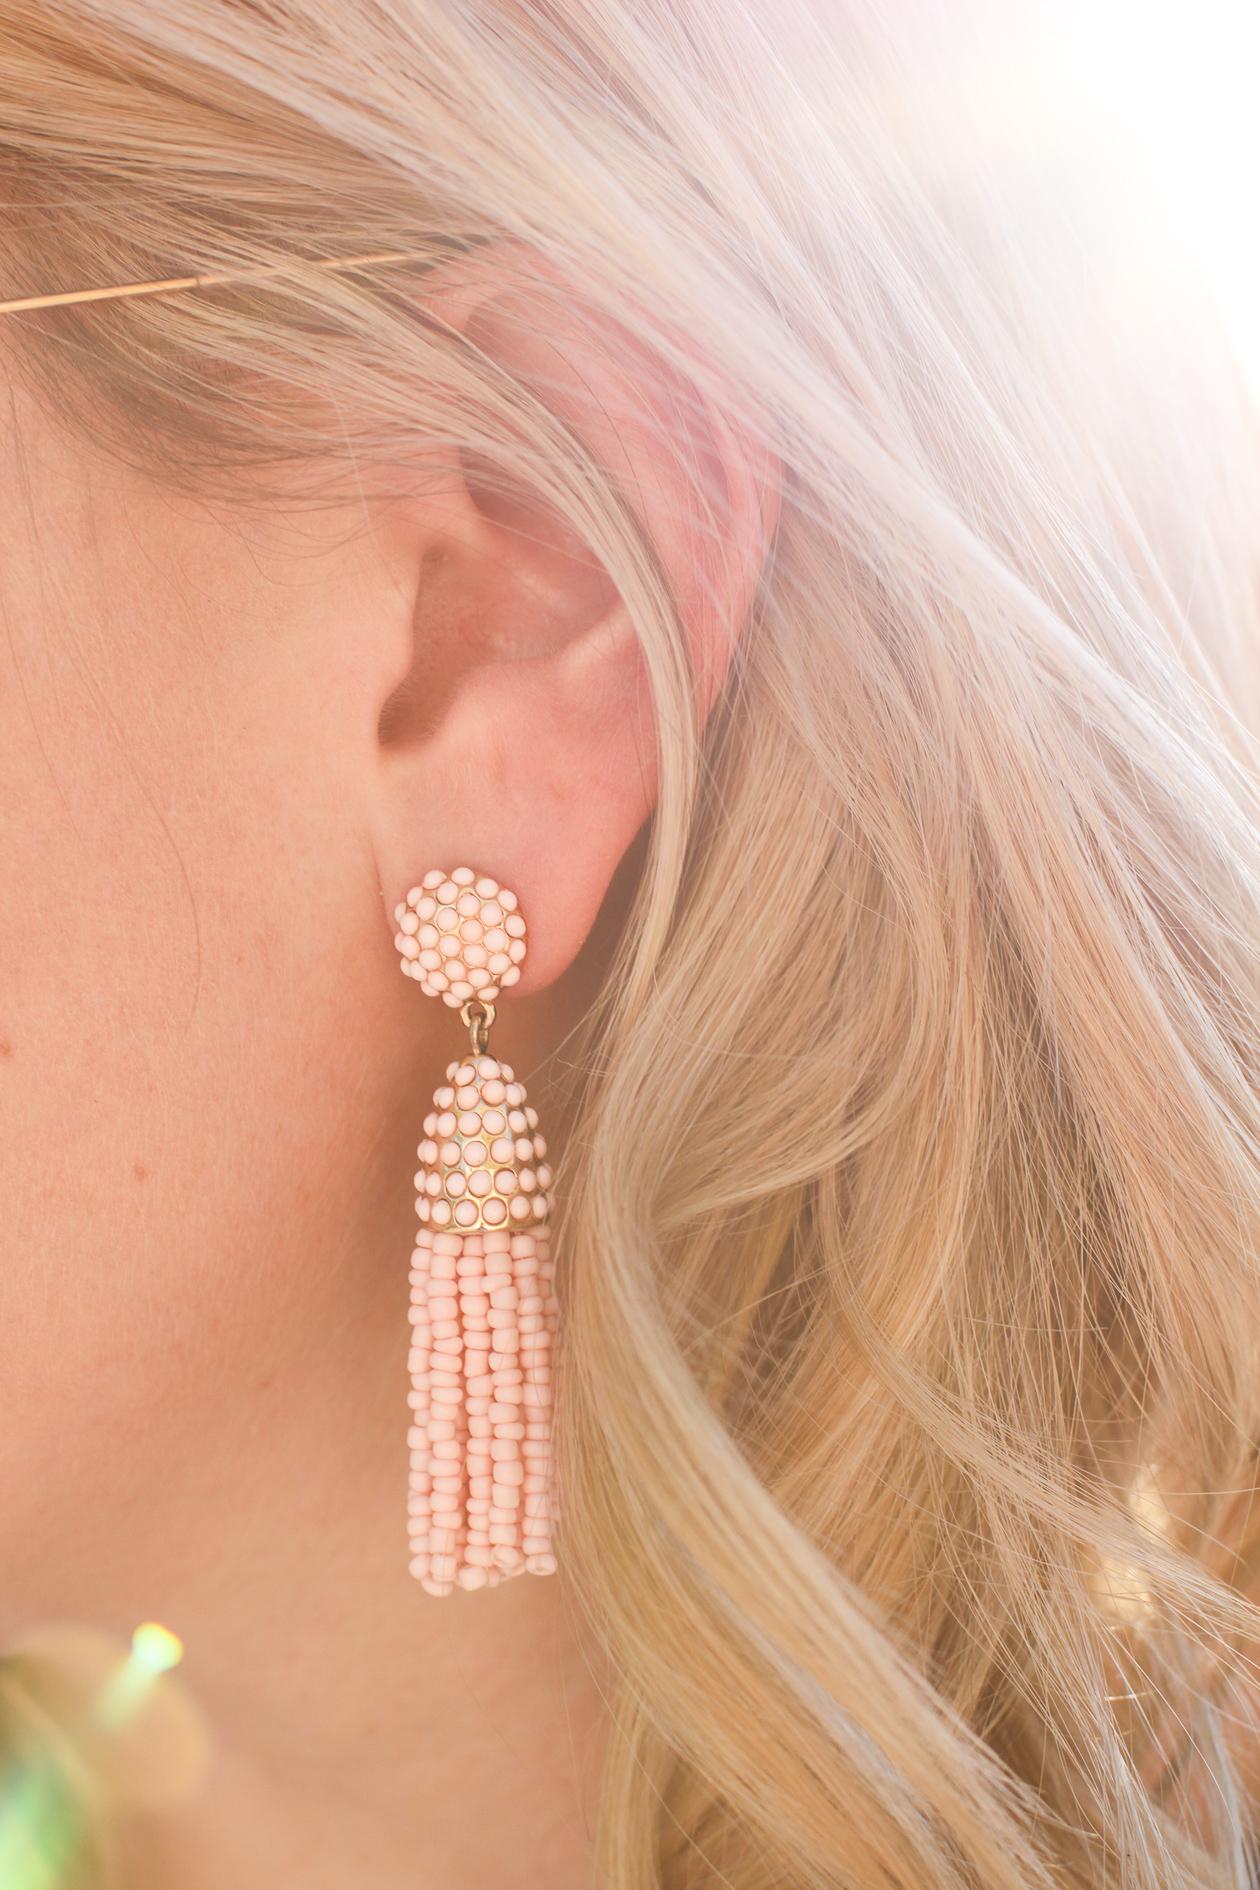 Baublebar Mini Pinata Tassel Earrings | @dcgirlinpearls